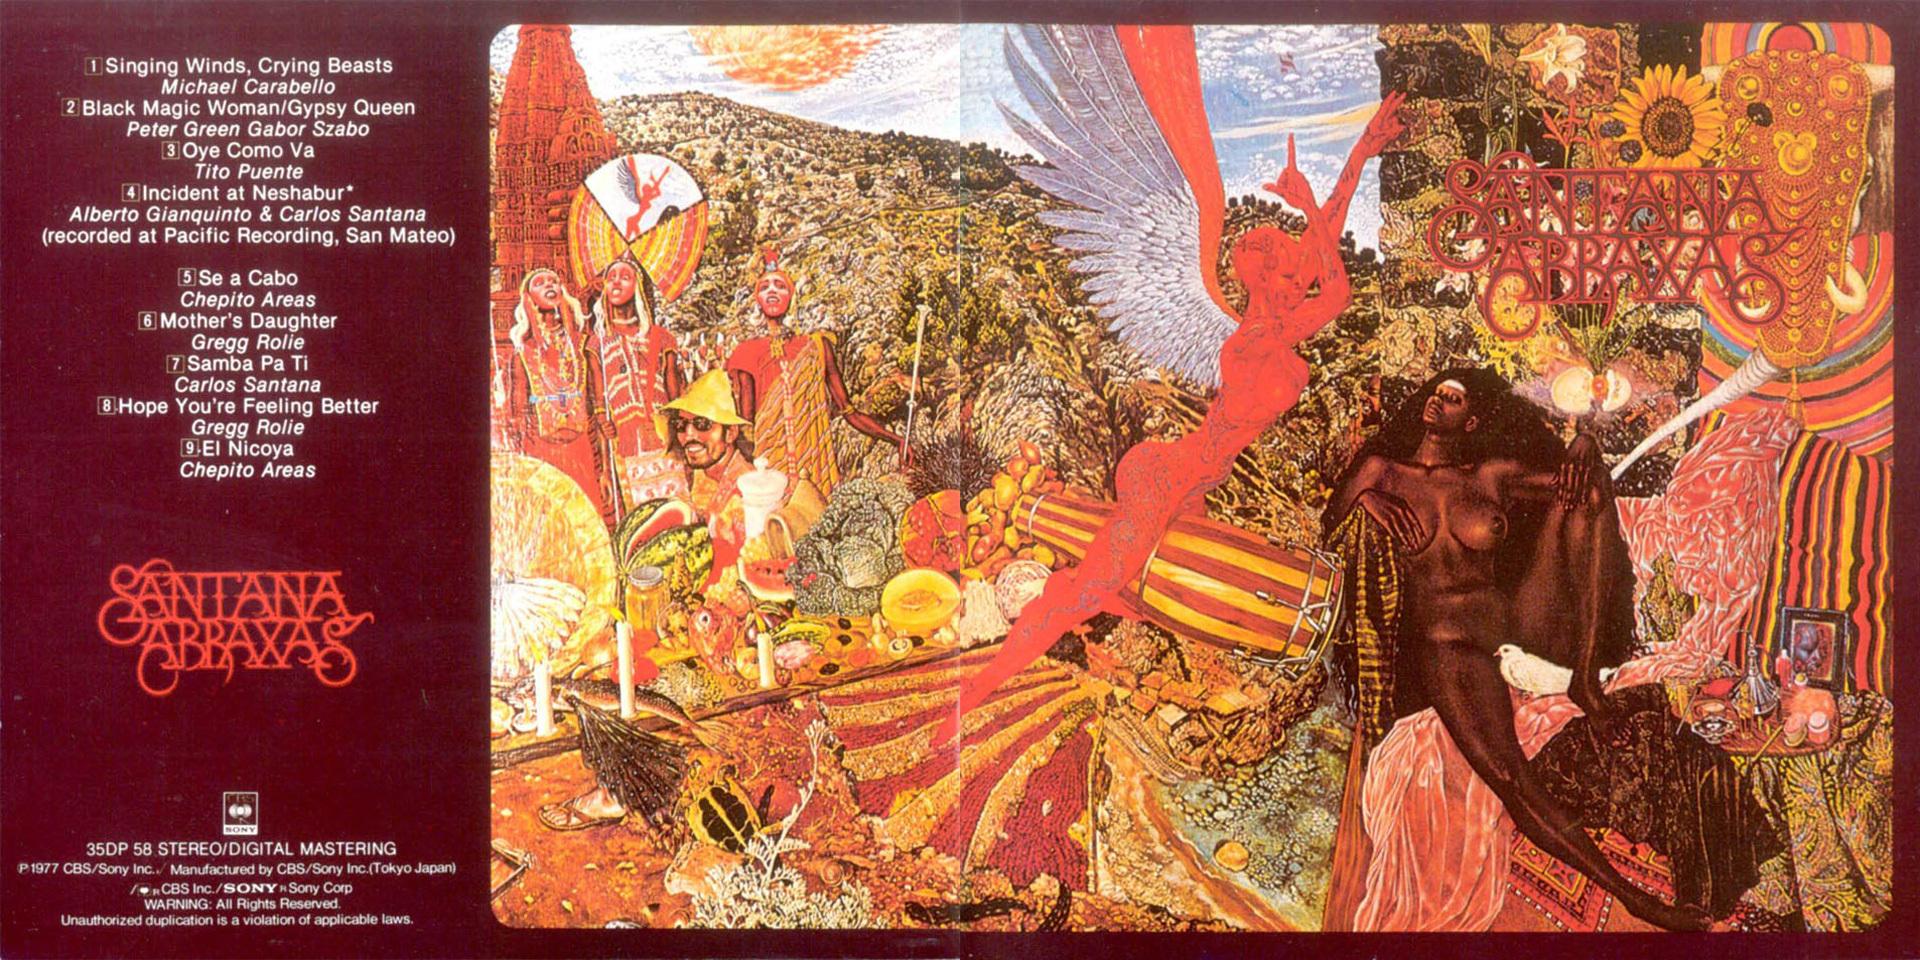 Carlos Santana Abraxas Album Artwork